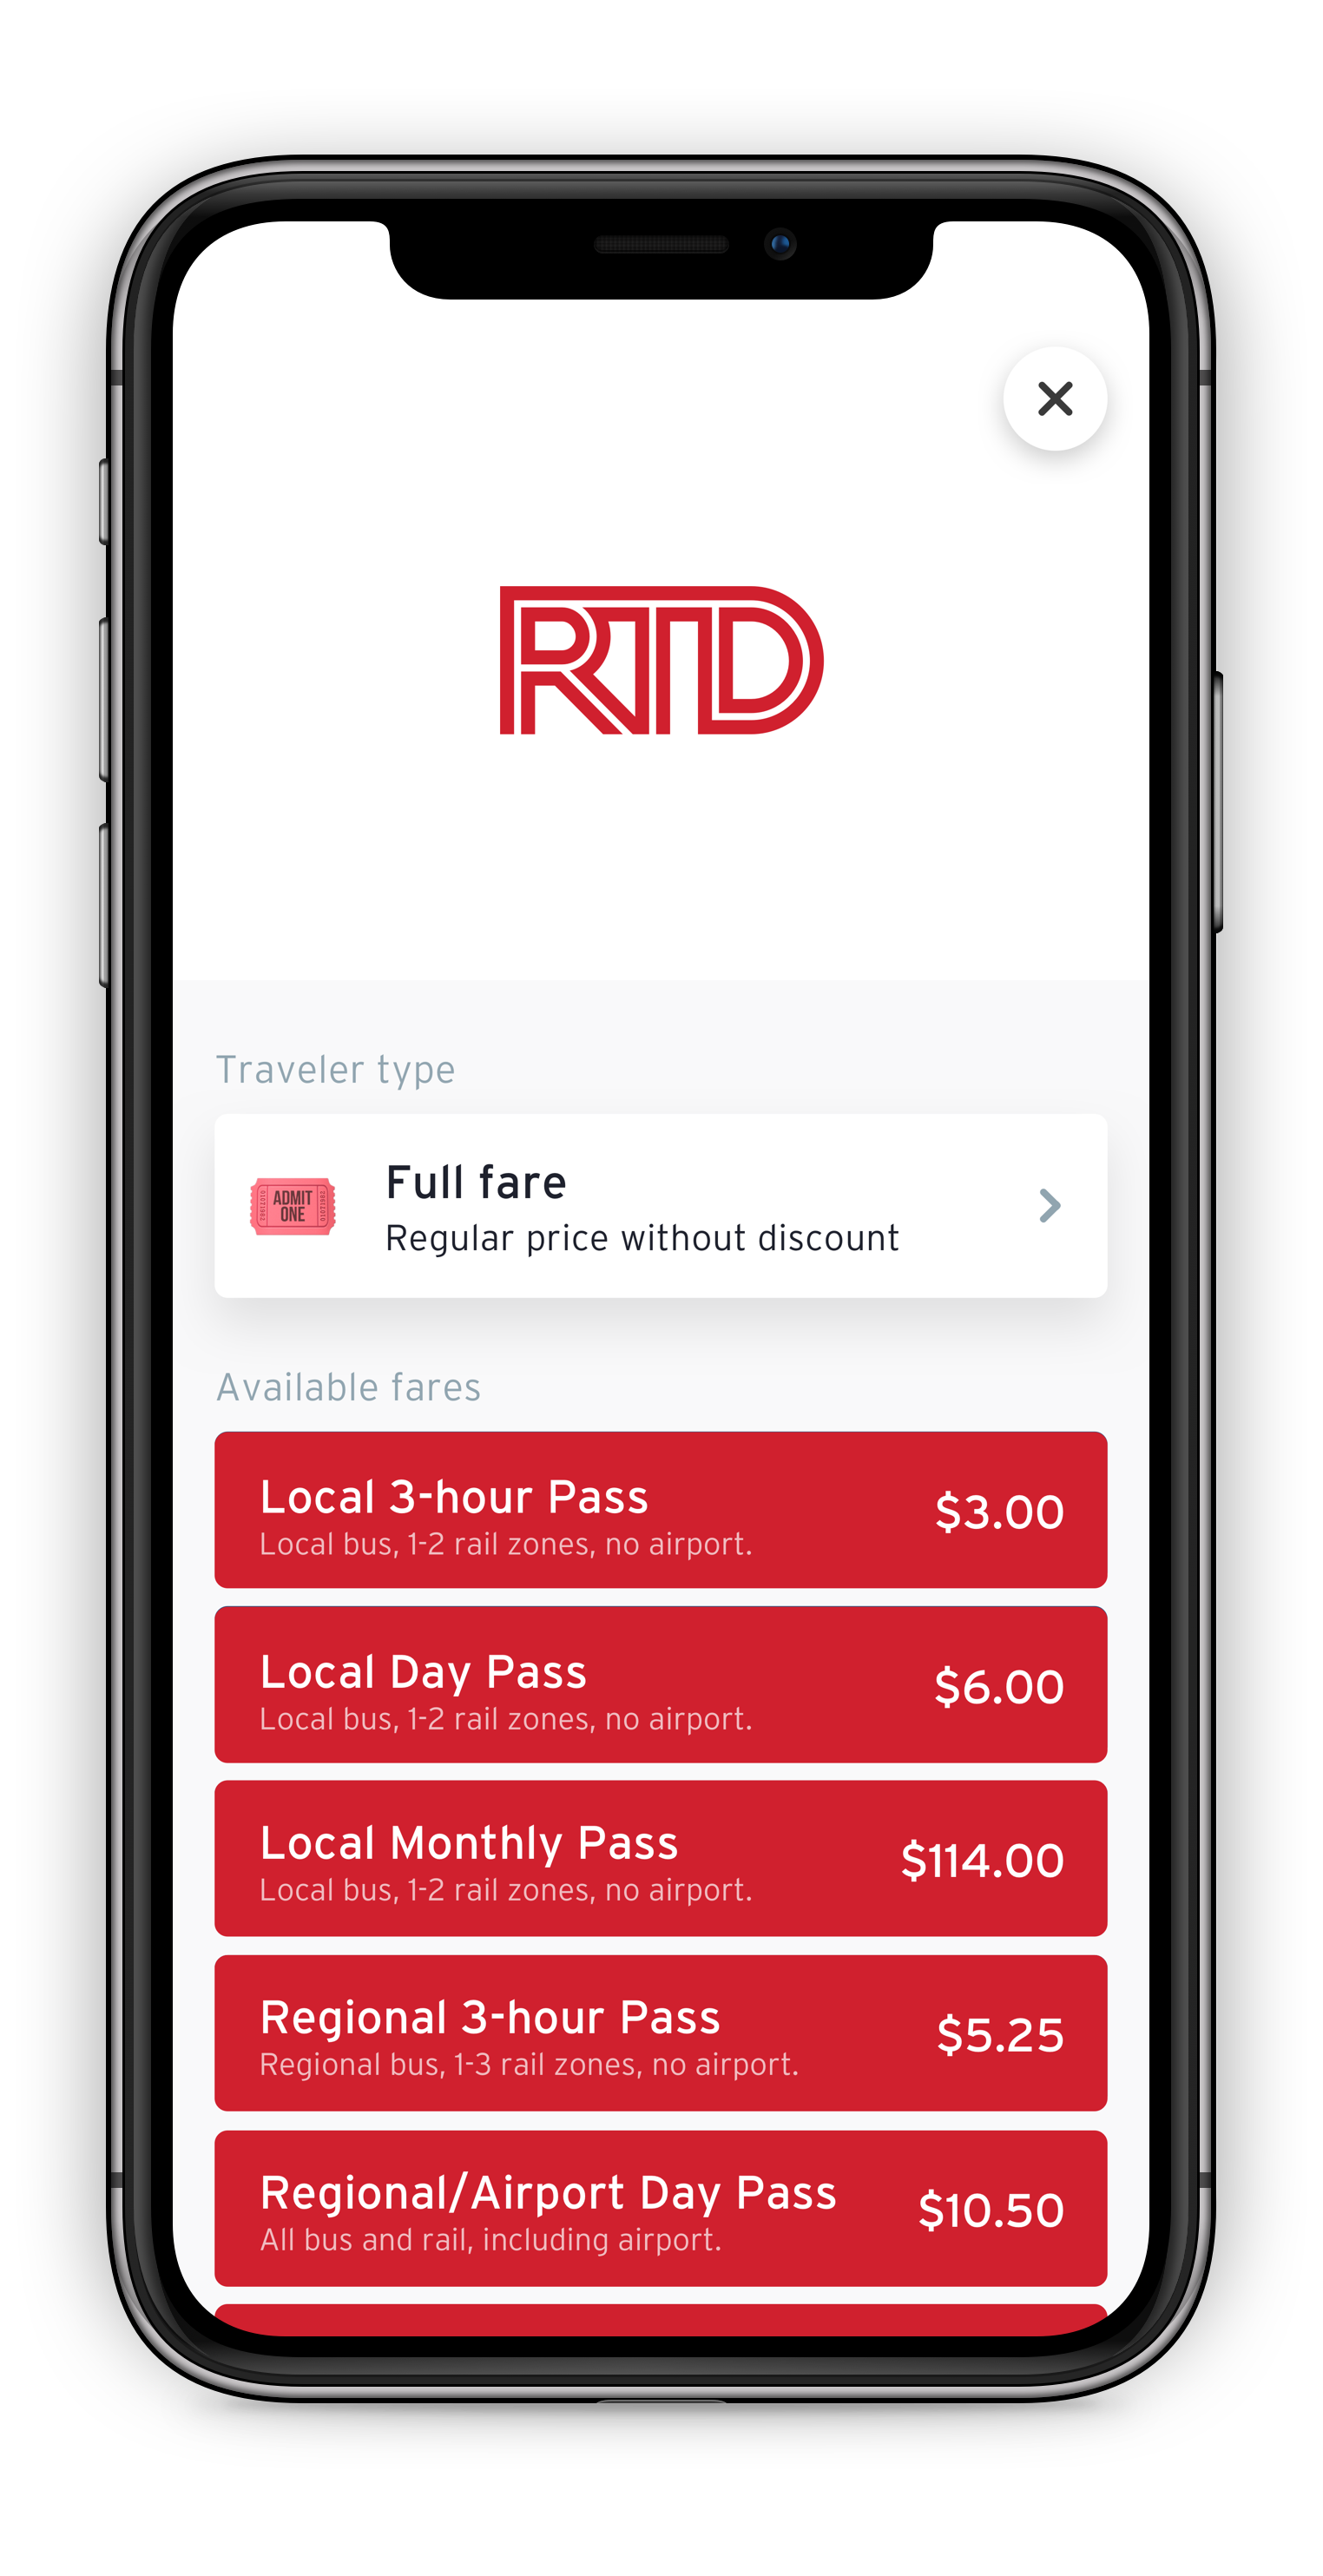 Transit App Ticketing Options for RTD